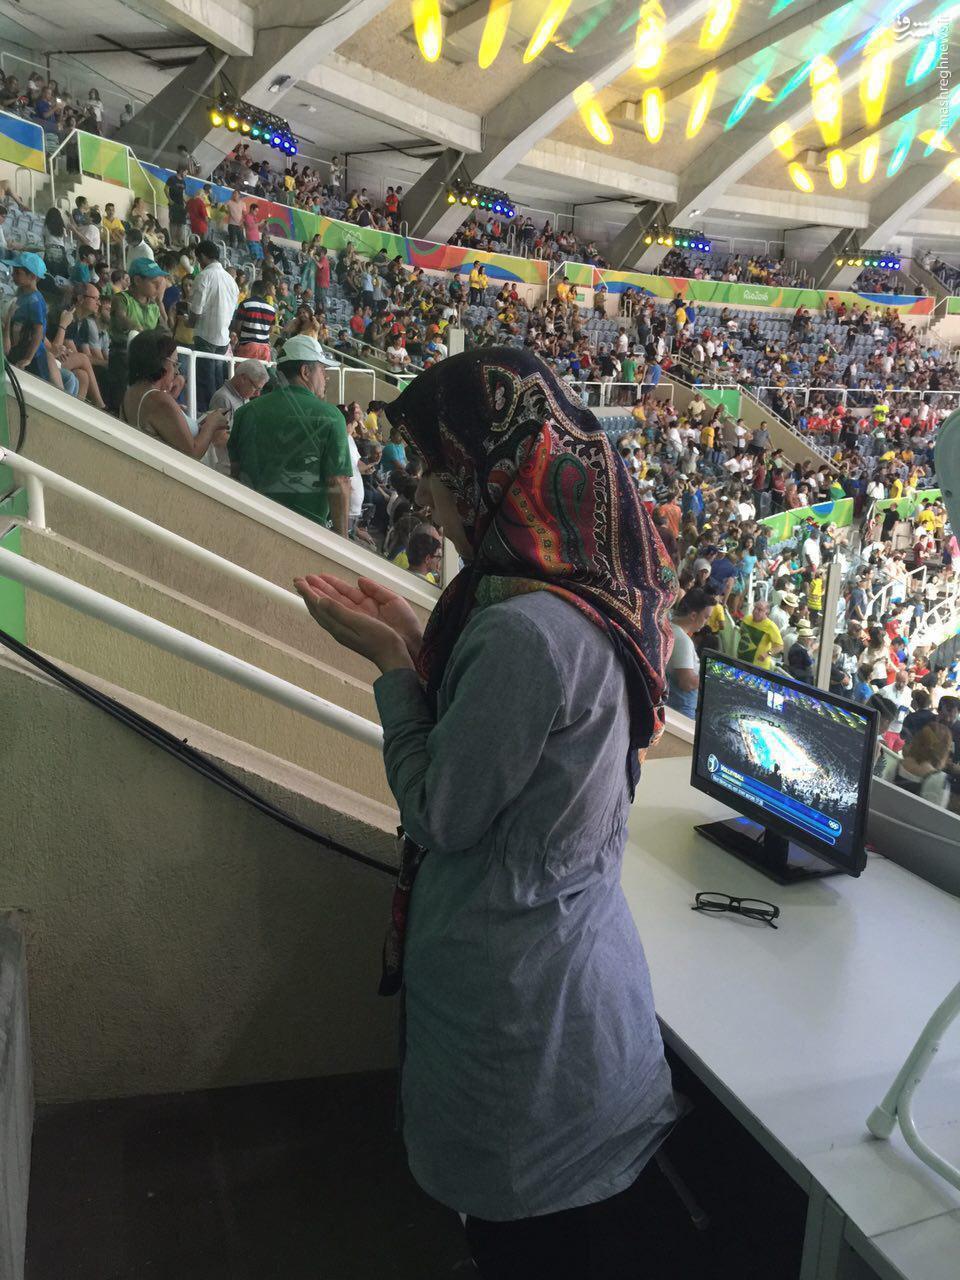 عکس/ حركت زيباي خبرنگار ايراني در ورزشگاه